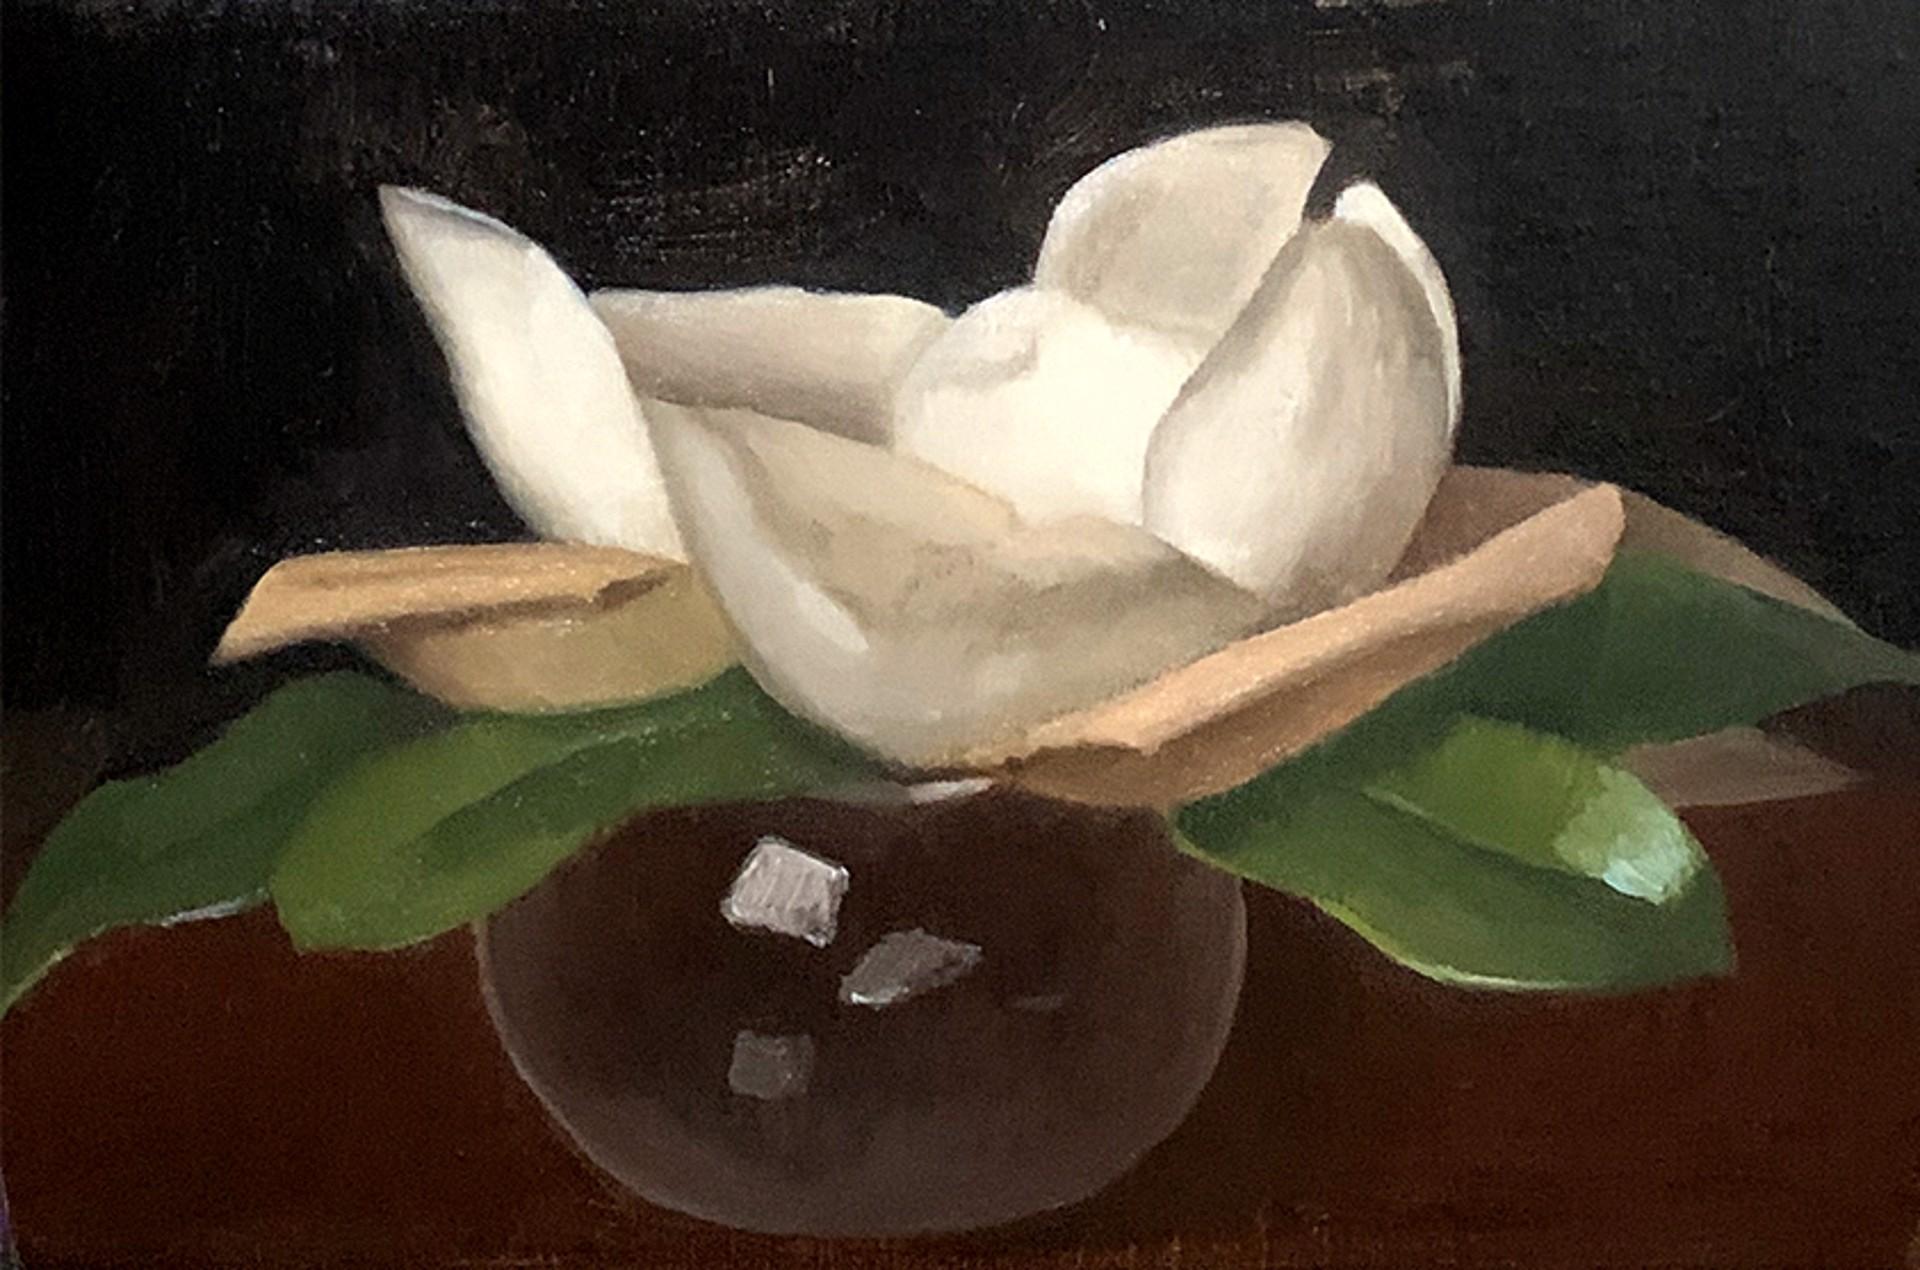 Magnolia Blossom by Laura Murphey